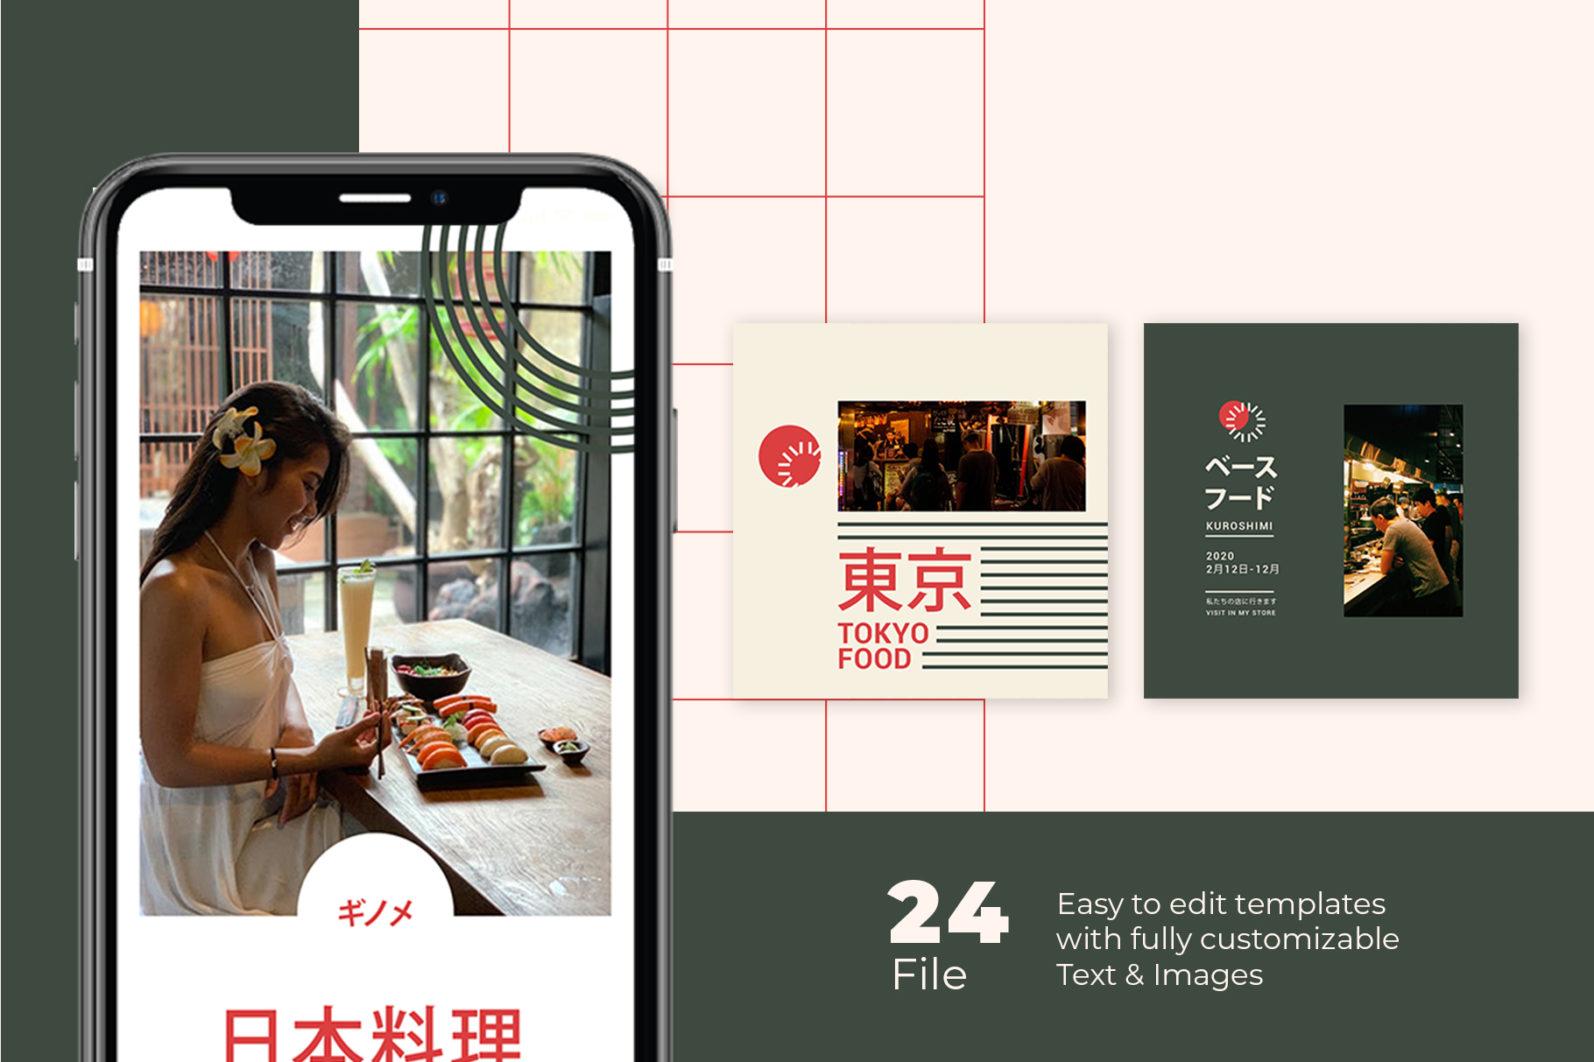 Japan Food Instagram Templates - new mockupp9 copy 5 -